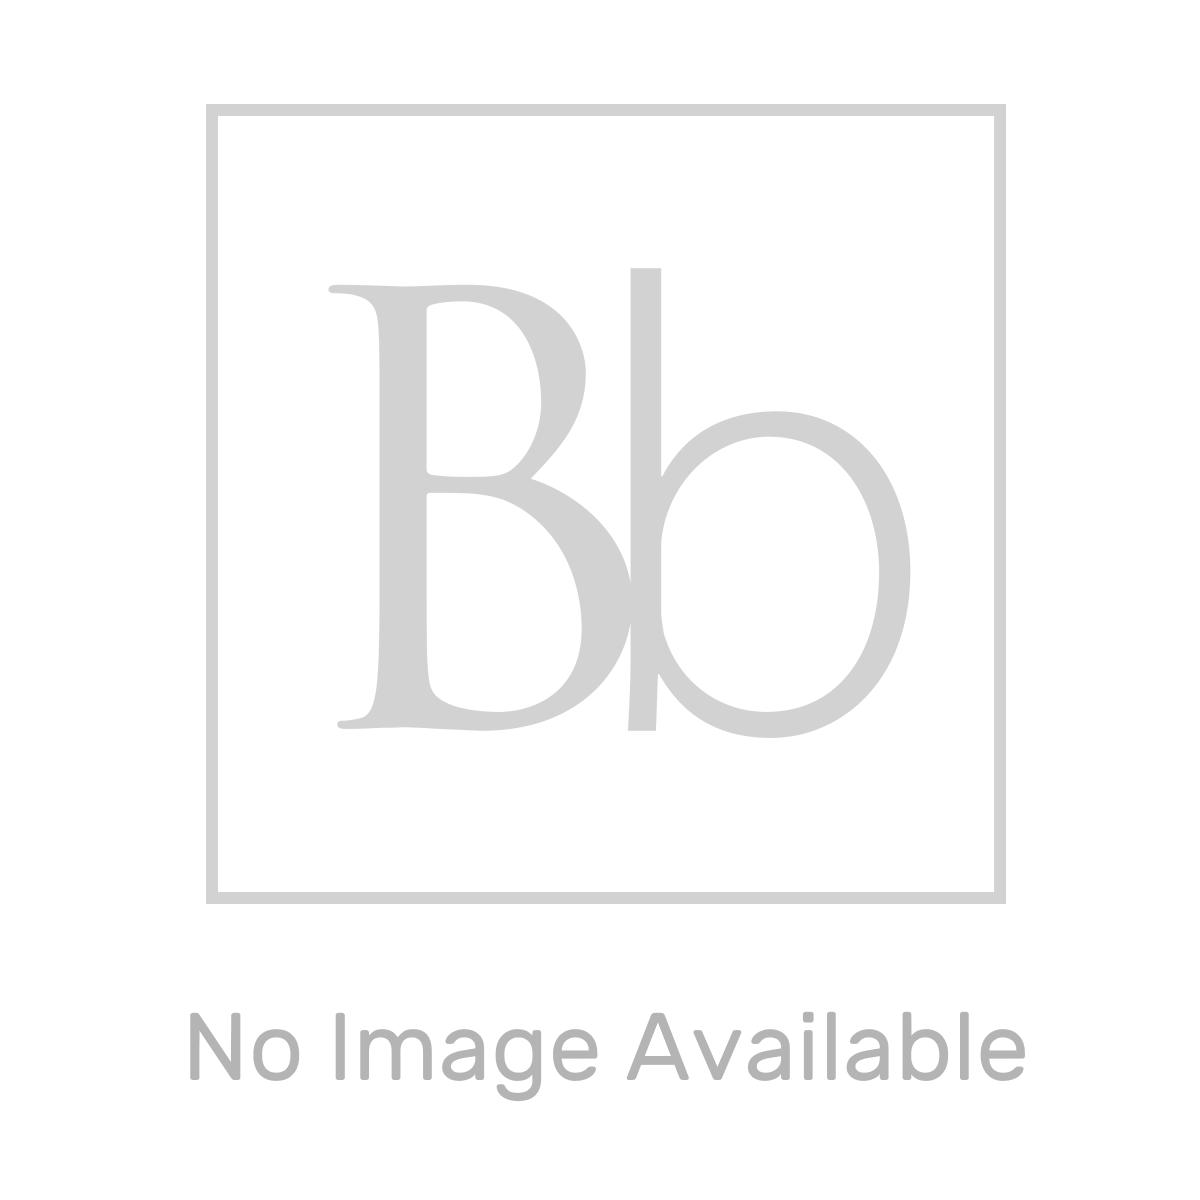 Ikoma White Gloss Vanity Unit with Basin 550mm